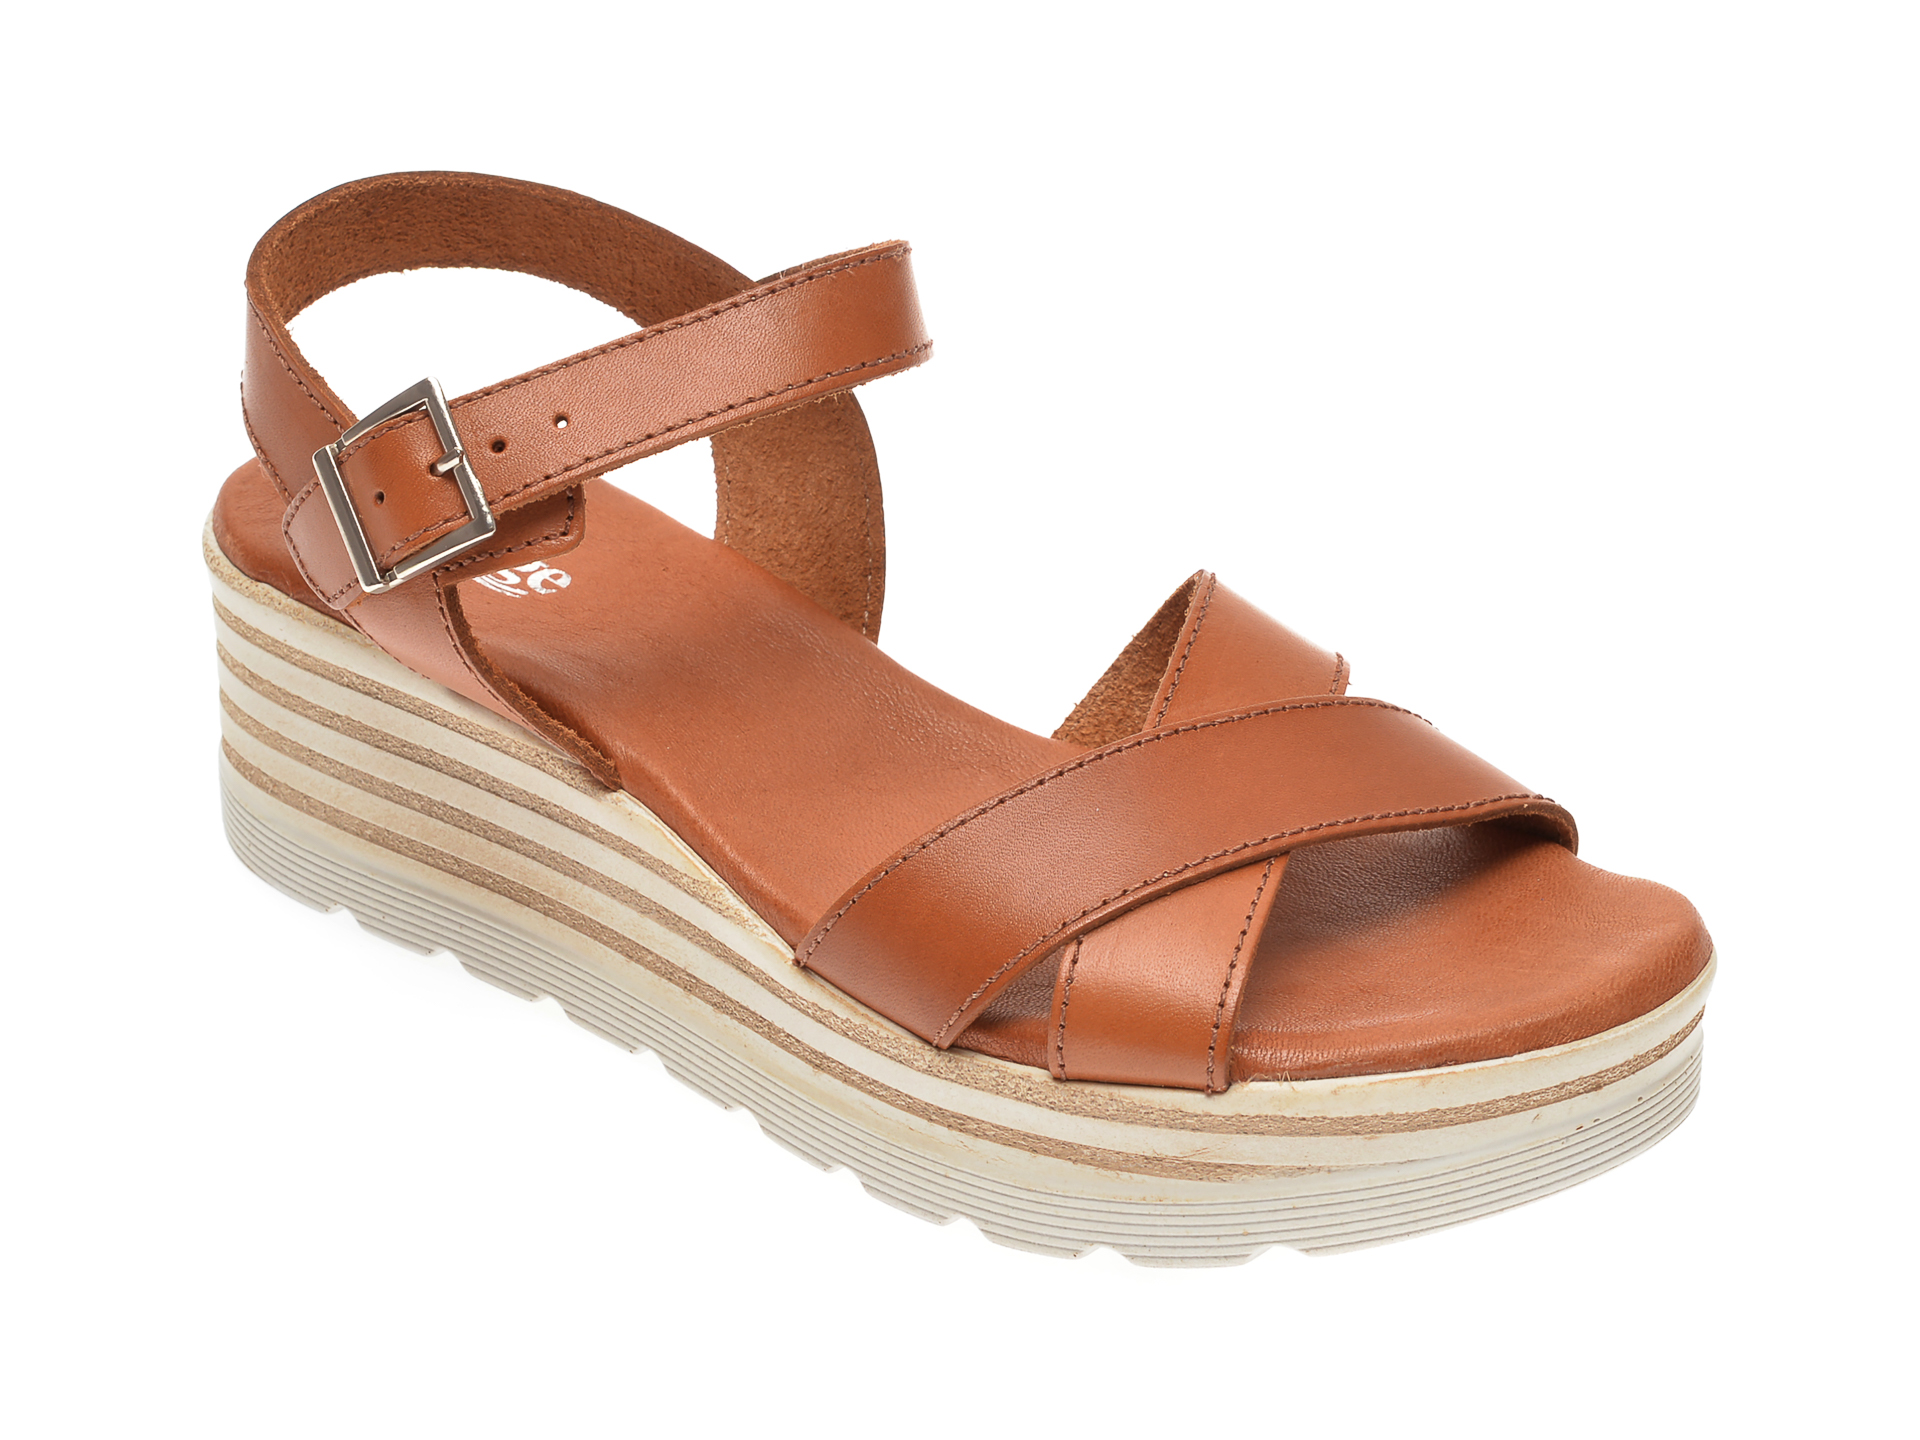 Sandale IMAGE maro, 8110, din piele naturala imagine